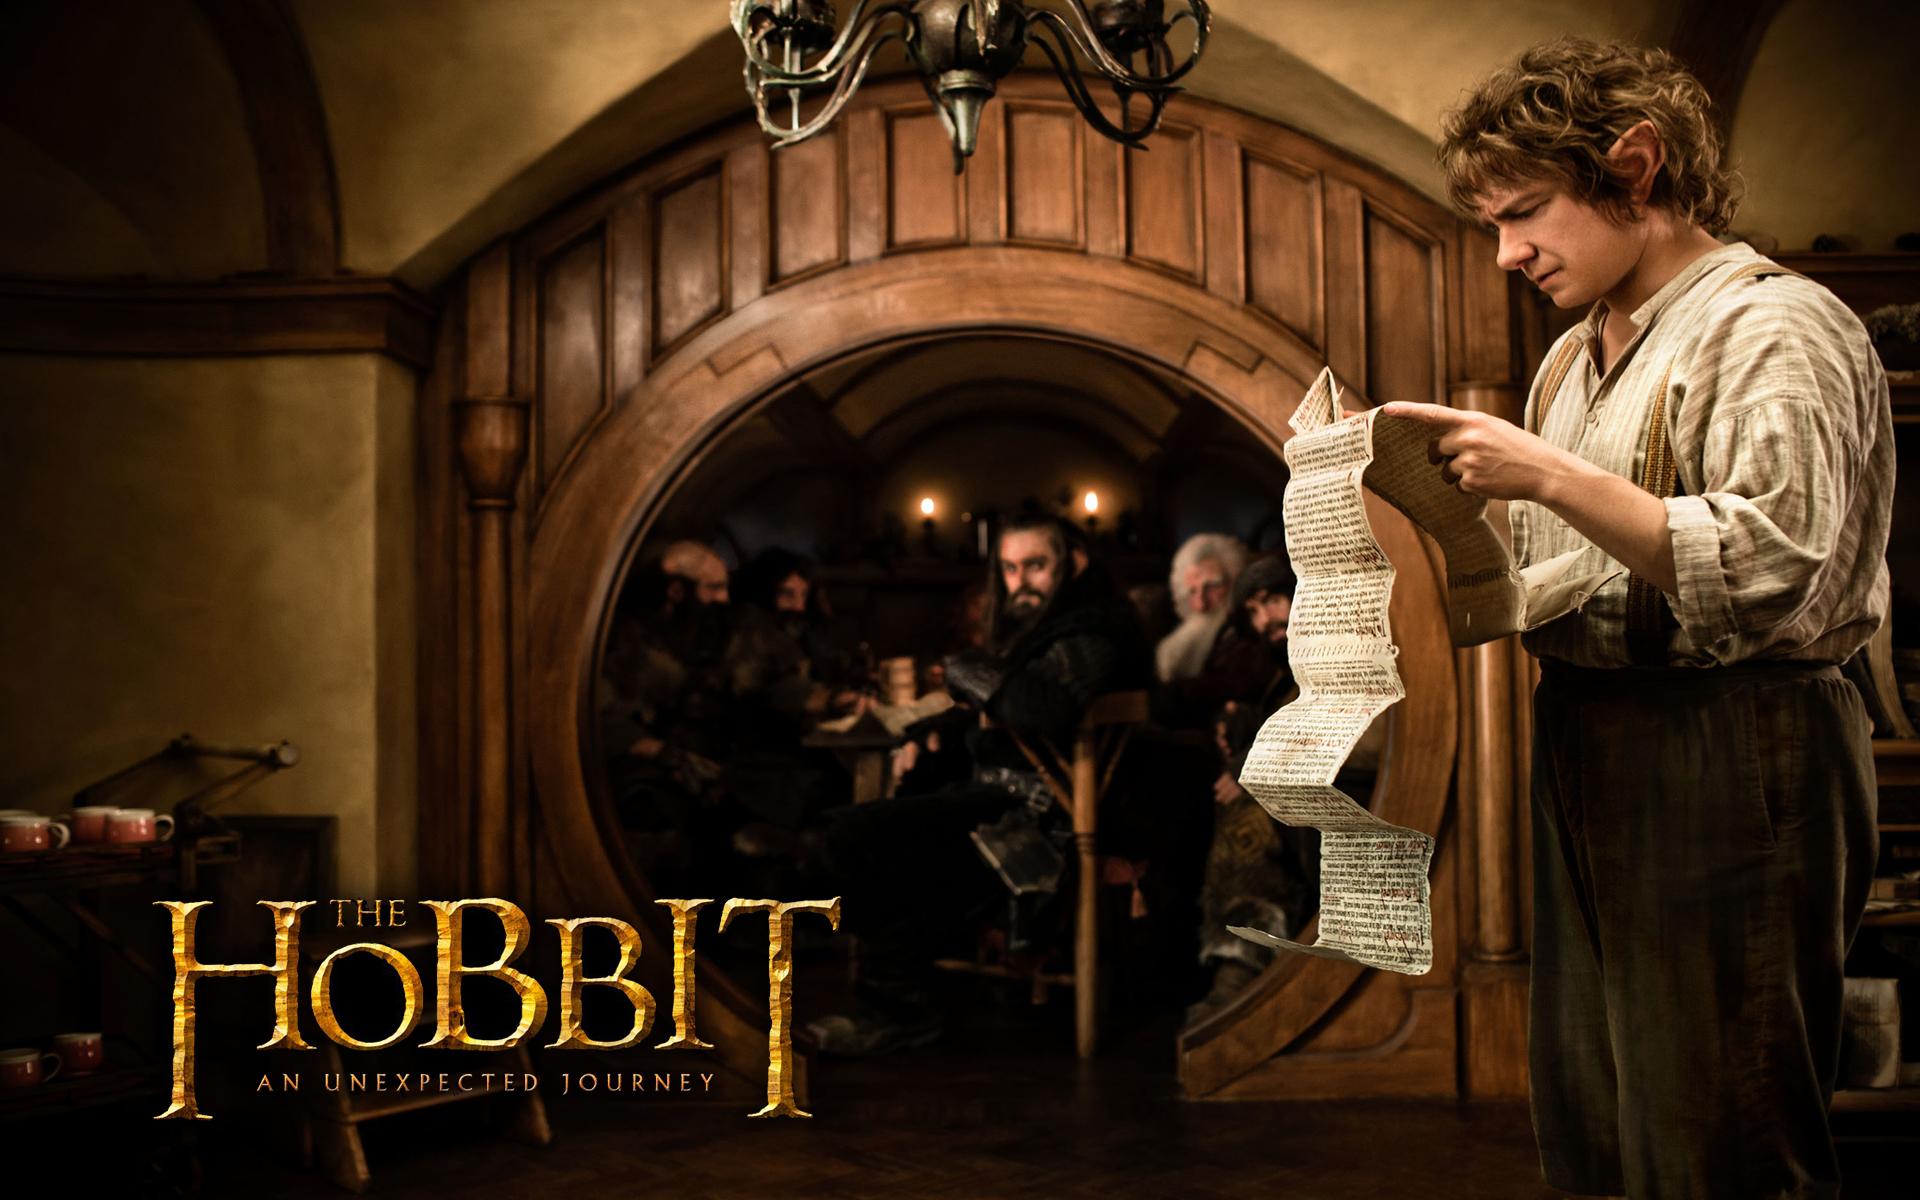 Bilbo Baggins in The Hobbit 2012 Wallpapers HD Wallpapers 1920x1200